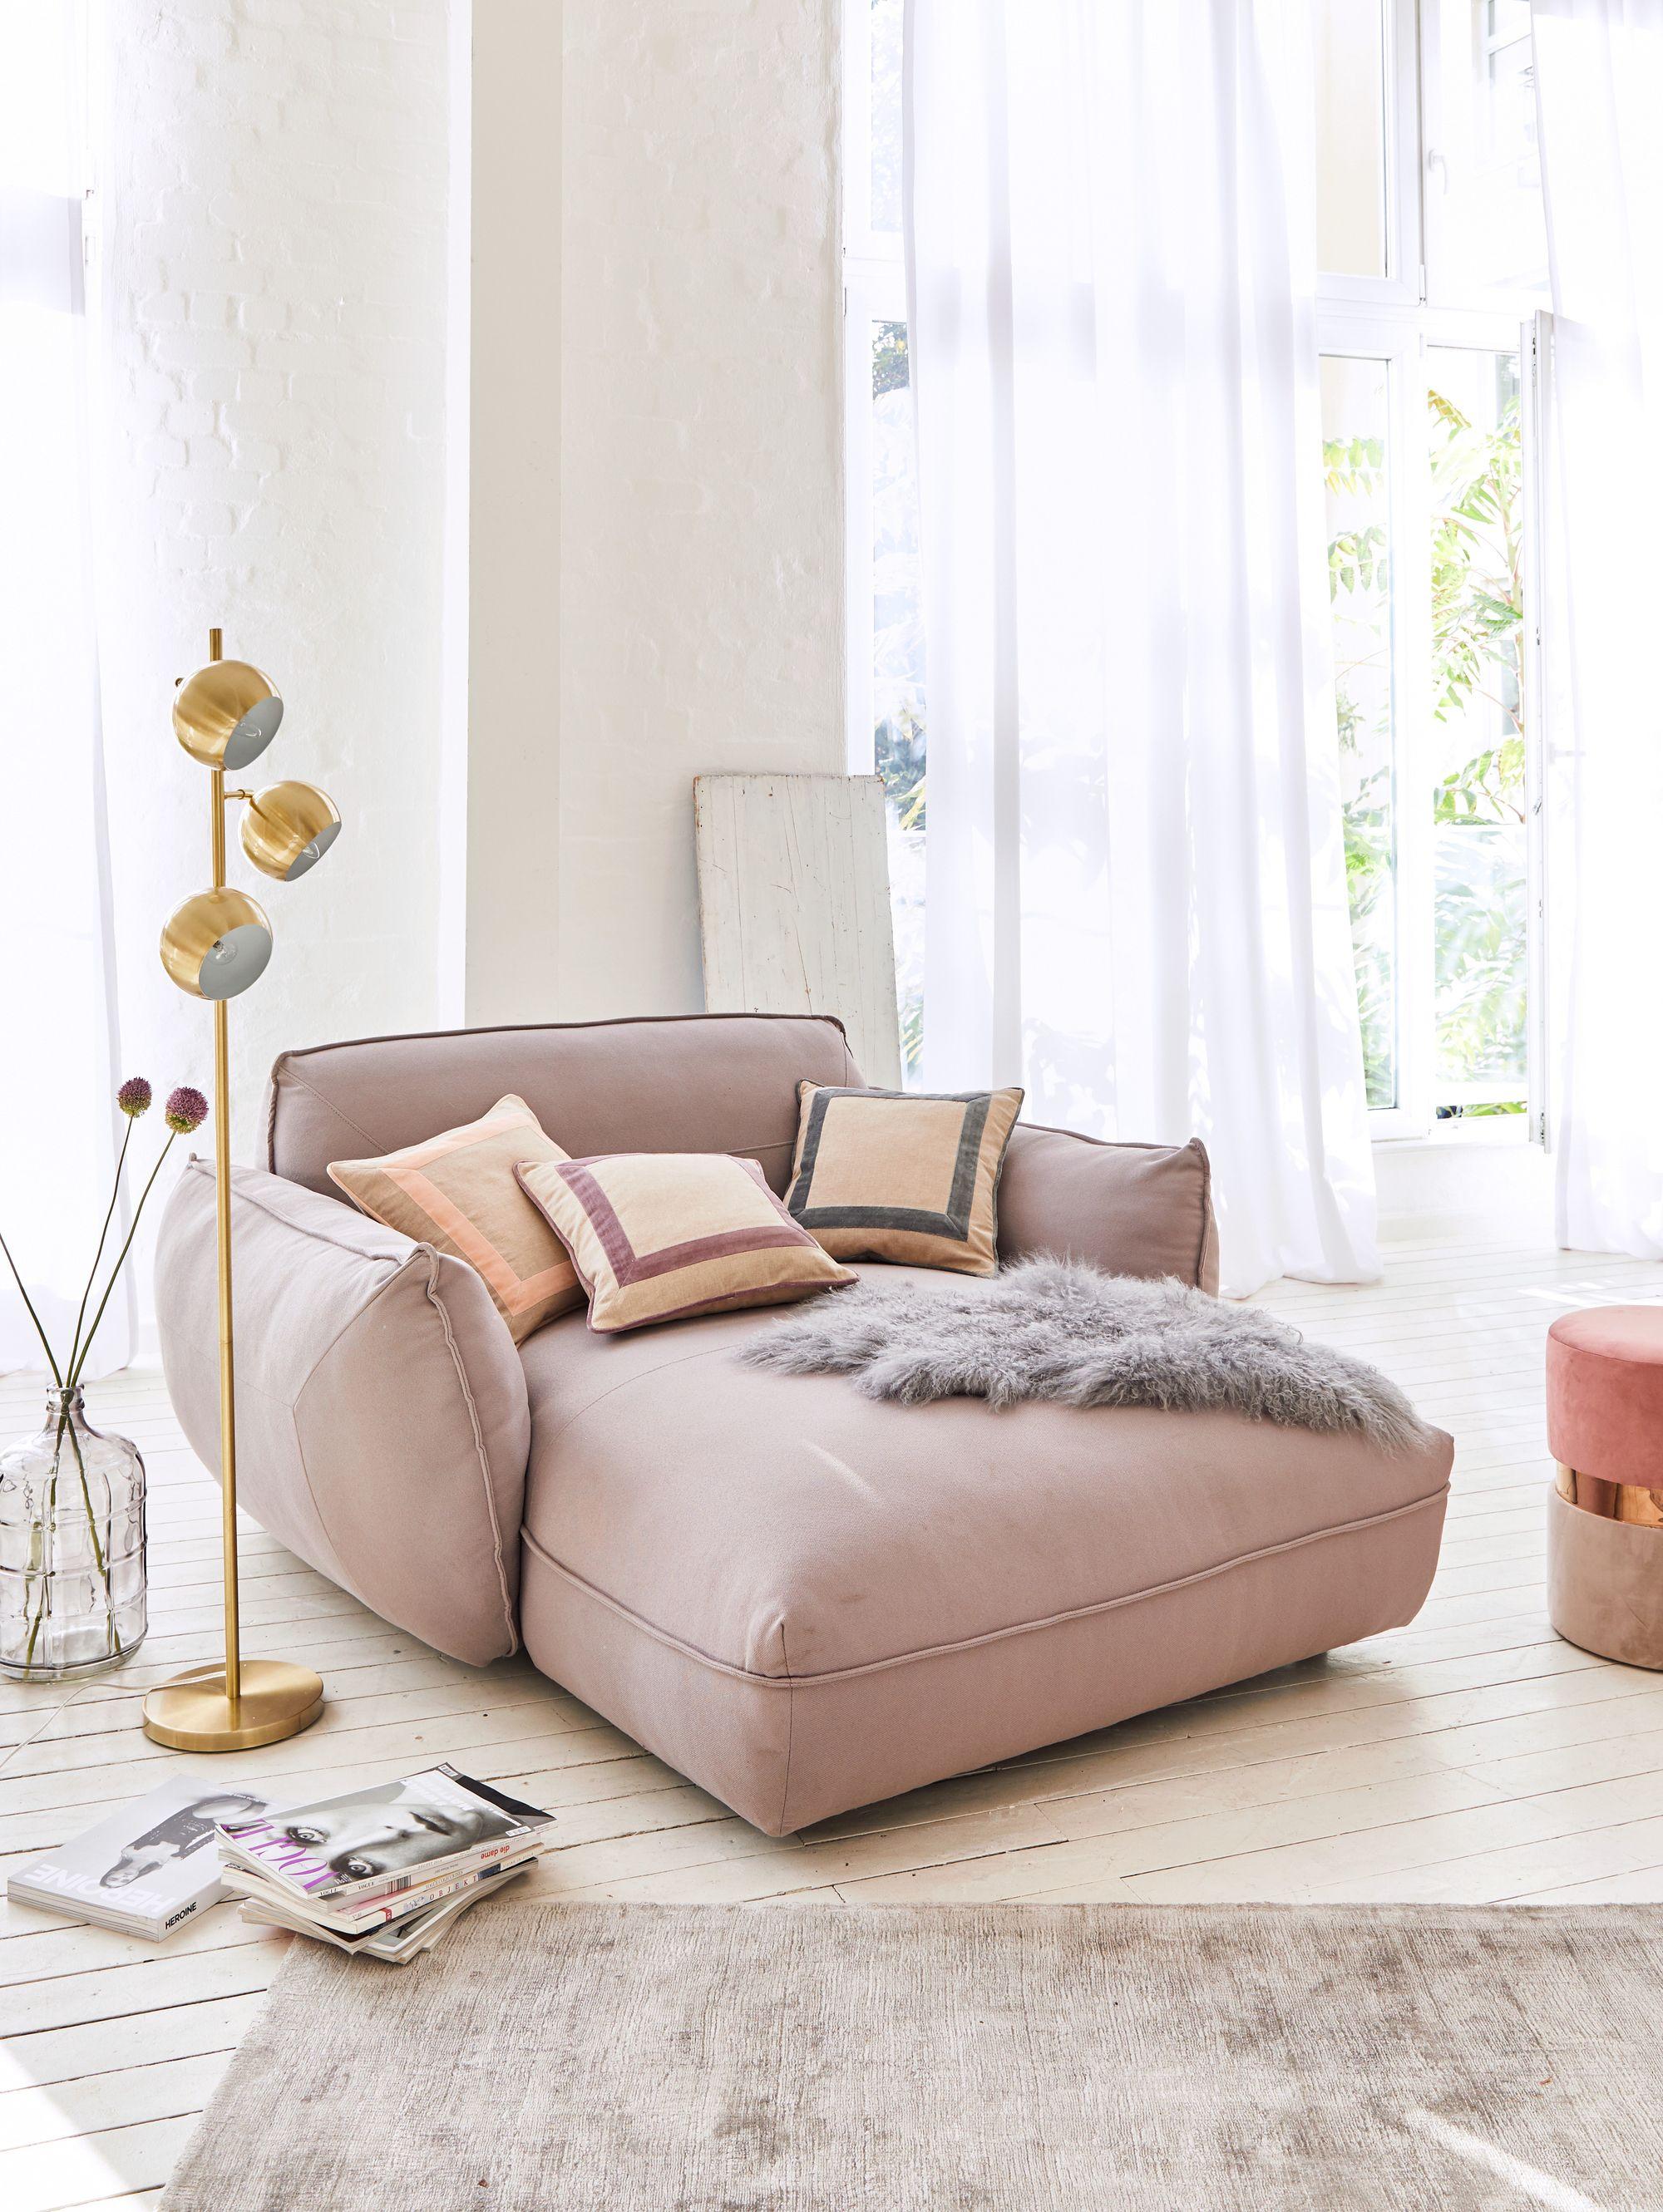 Gemütliche Ecke Cozy Impressionenliving Sessel Gemütlich Gemütlicher Sessel Sitzecke Schlafzimmer Sessel